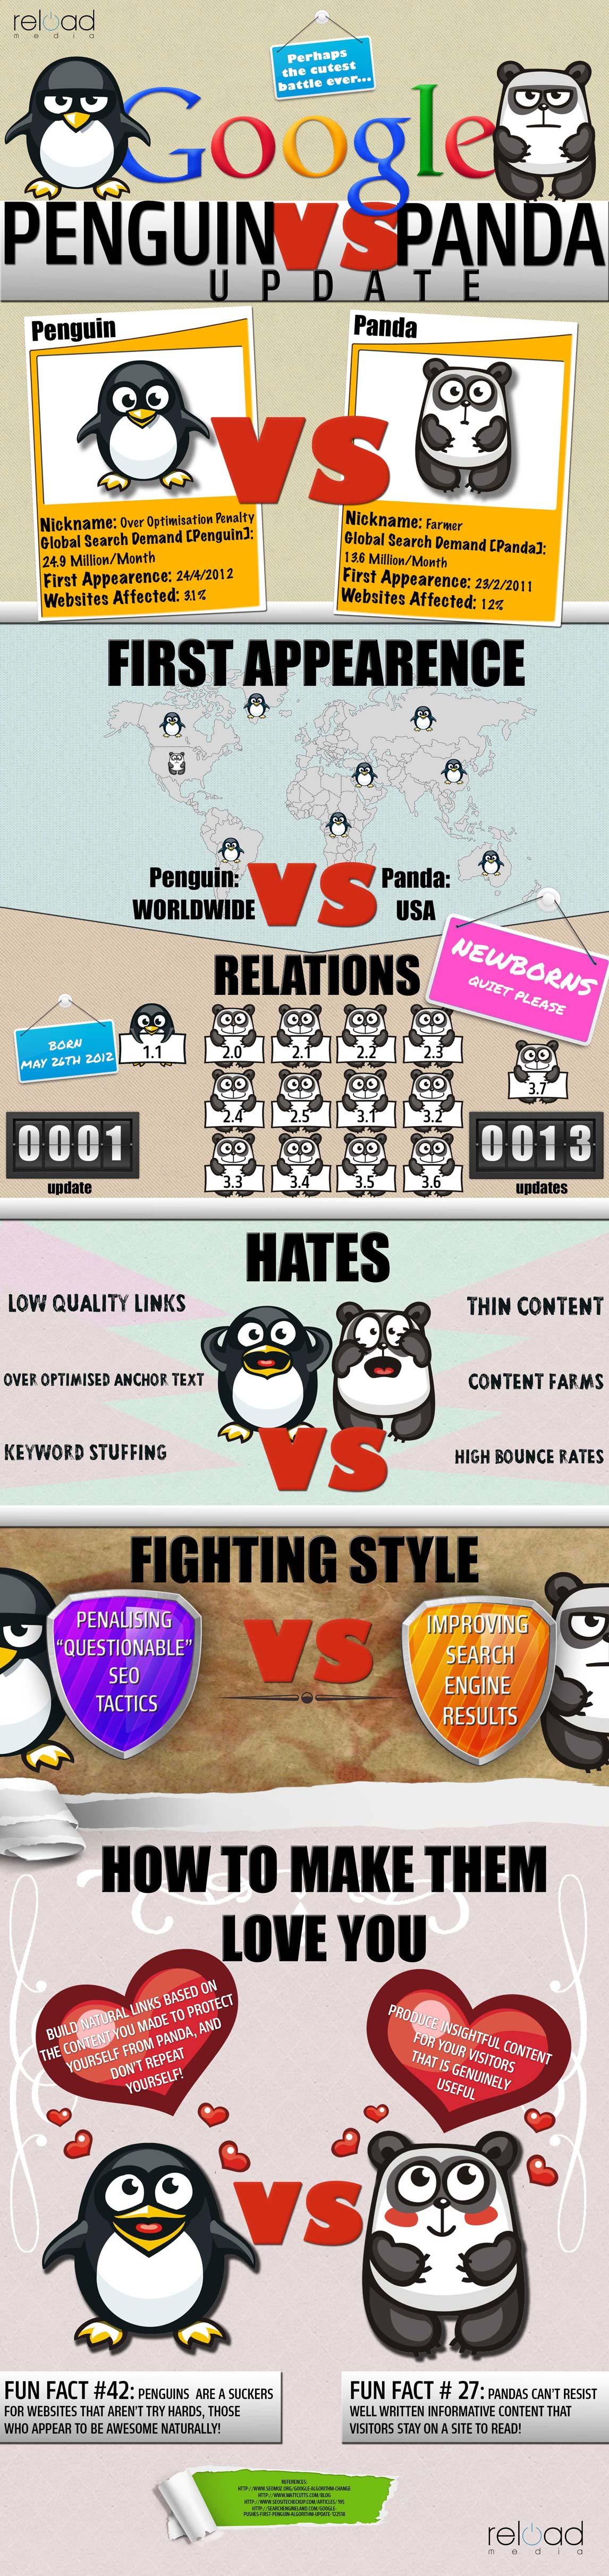 Penguin-Vs-Panda-Update-Infographic